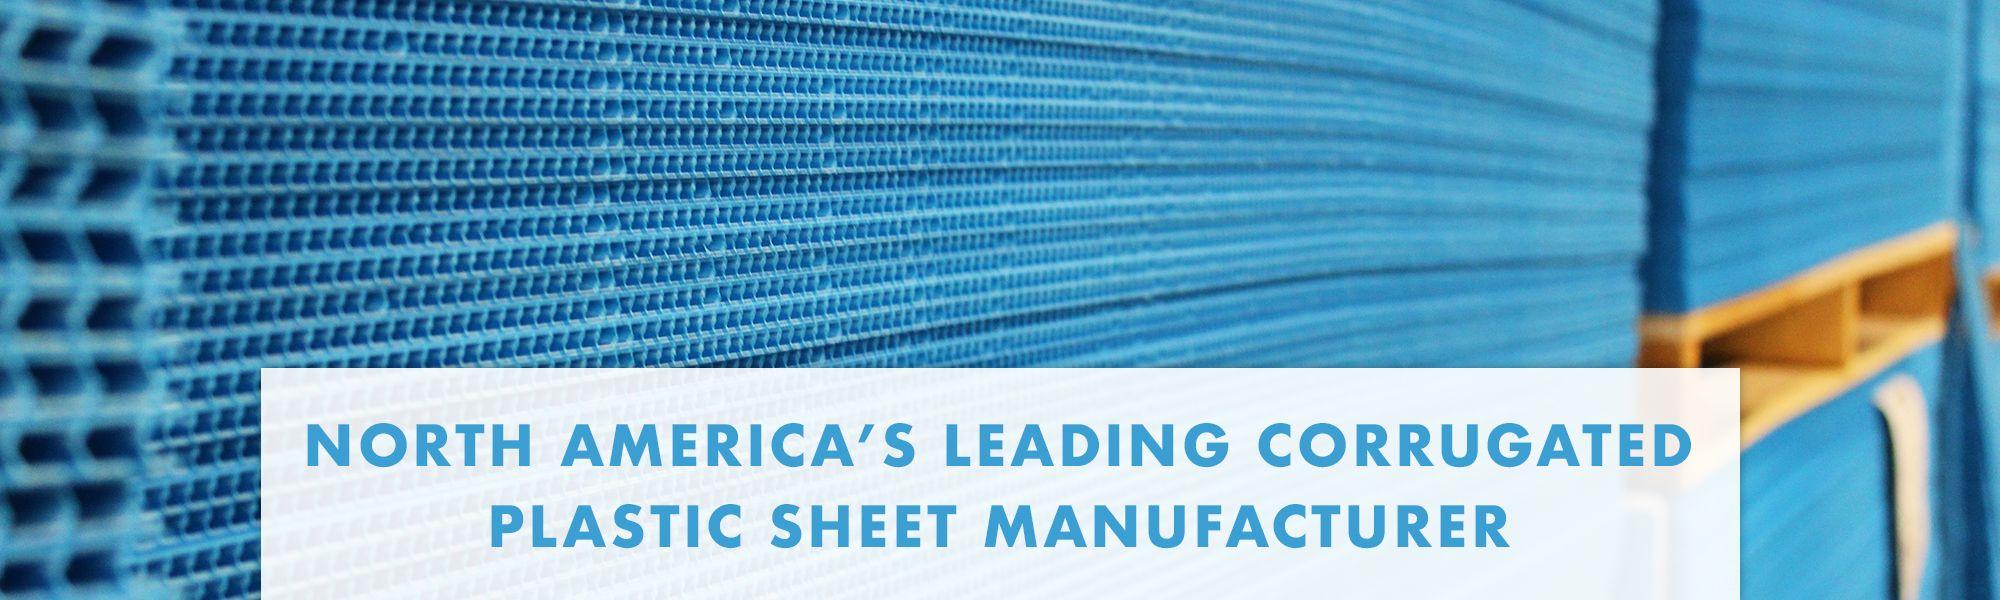 corrugated-plastic-sheet-manufacturer.jpg